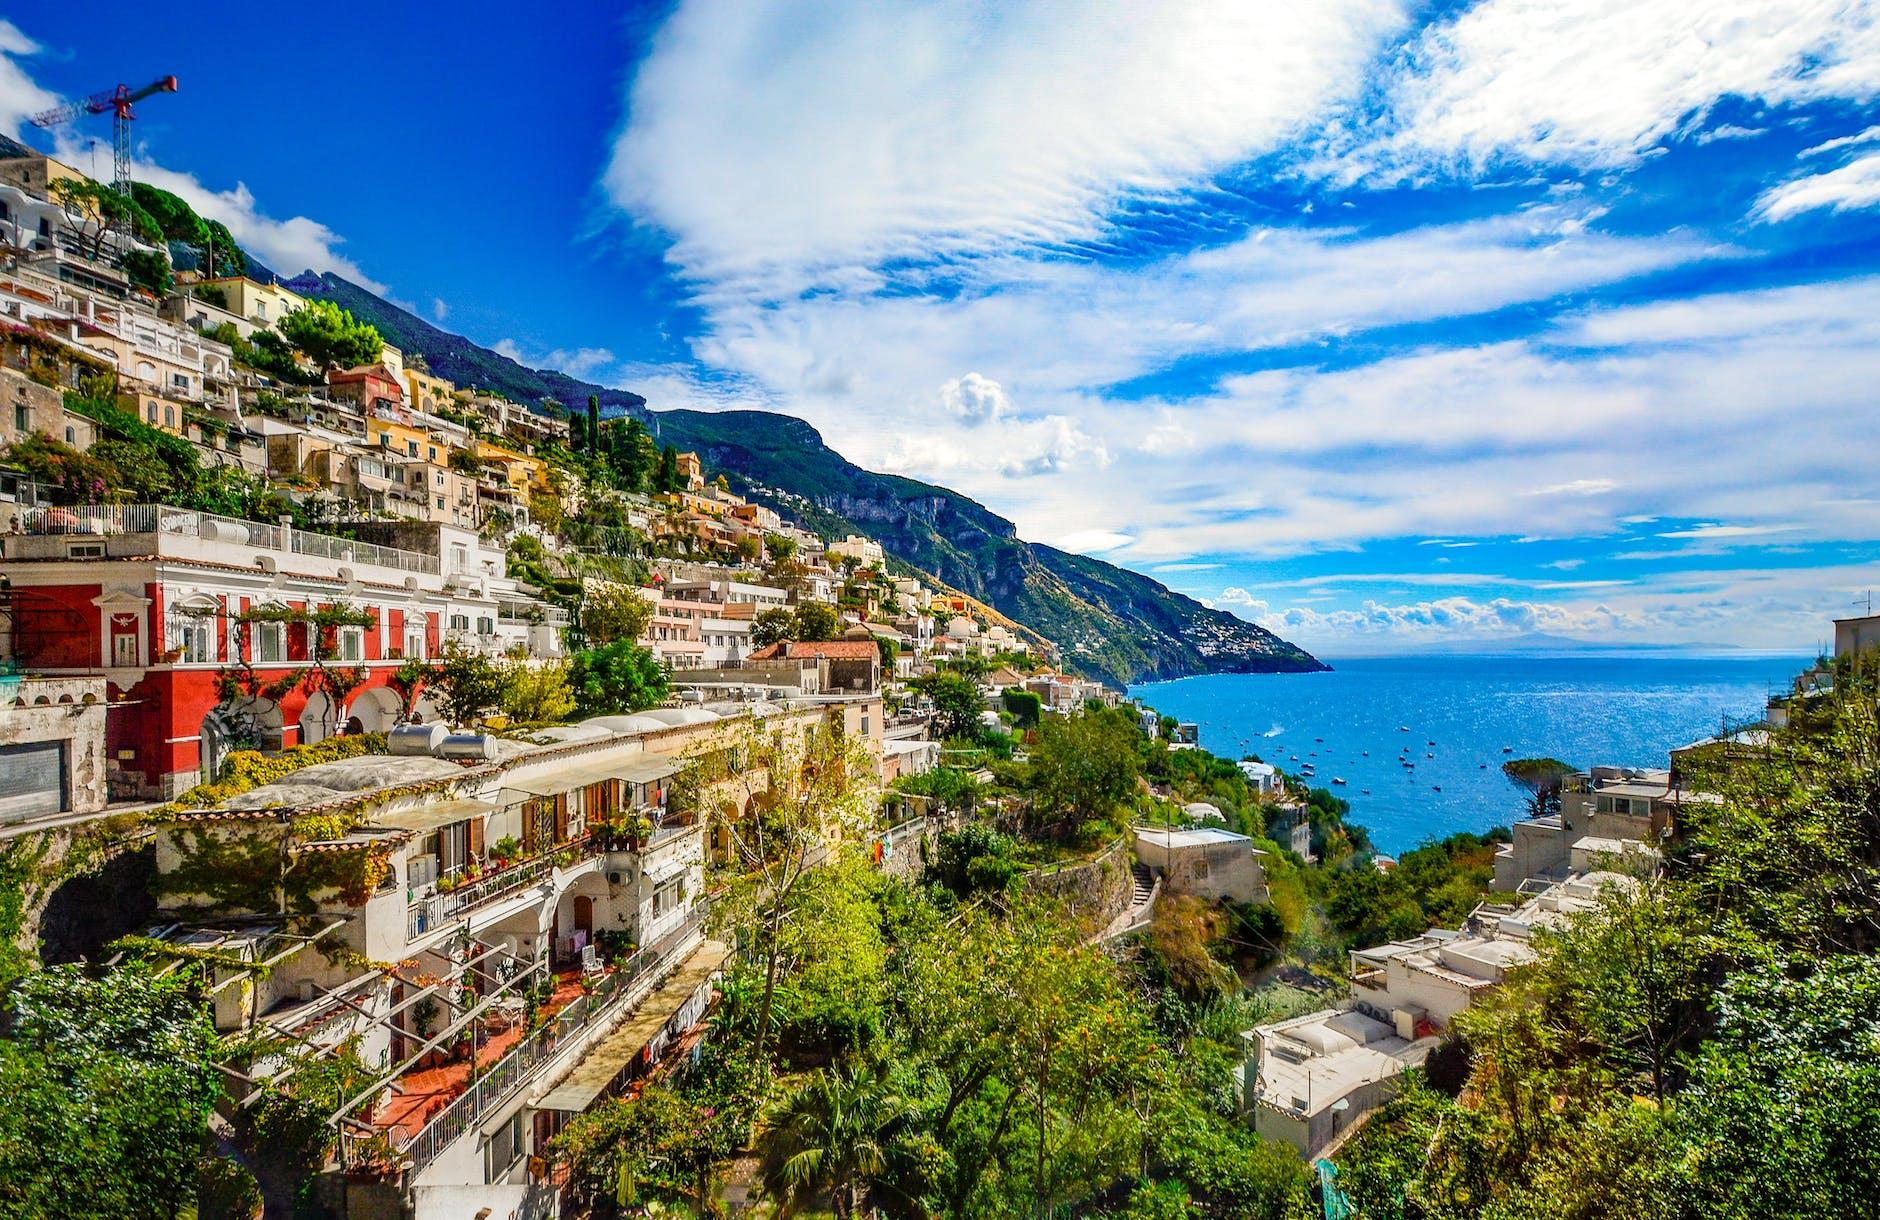 Italy Beautiful Landscape